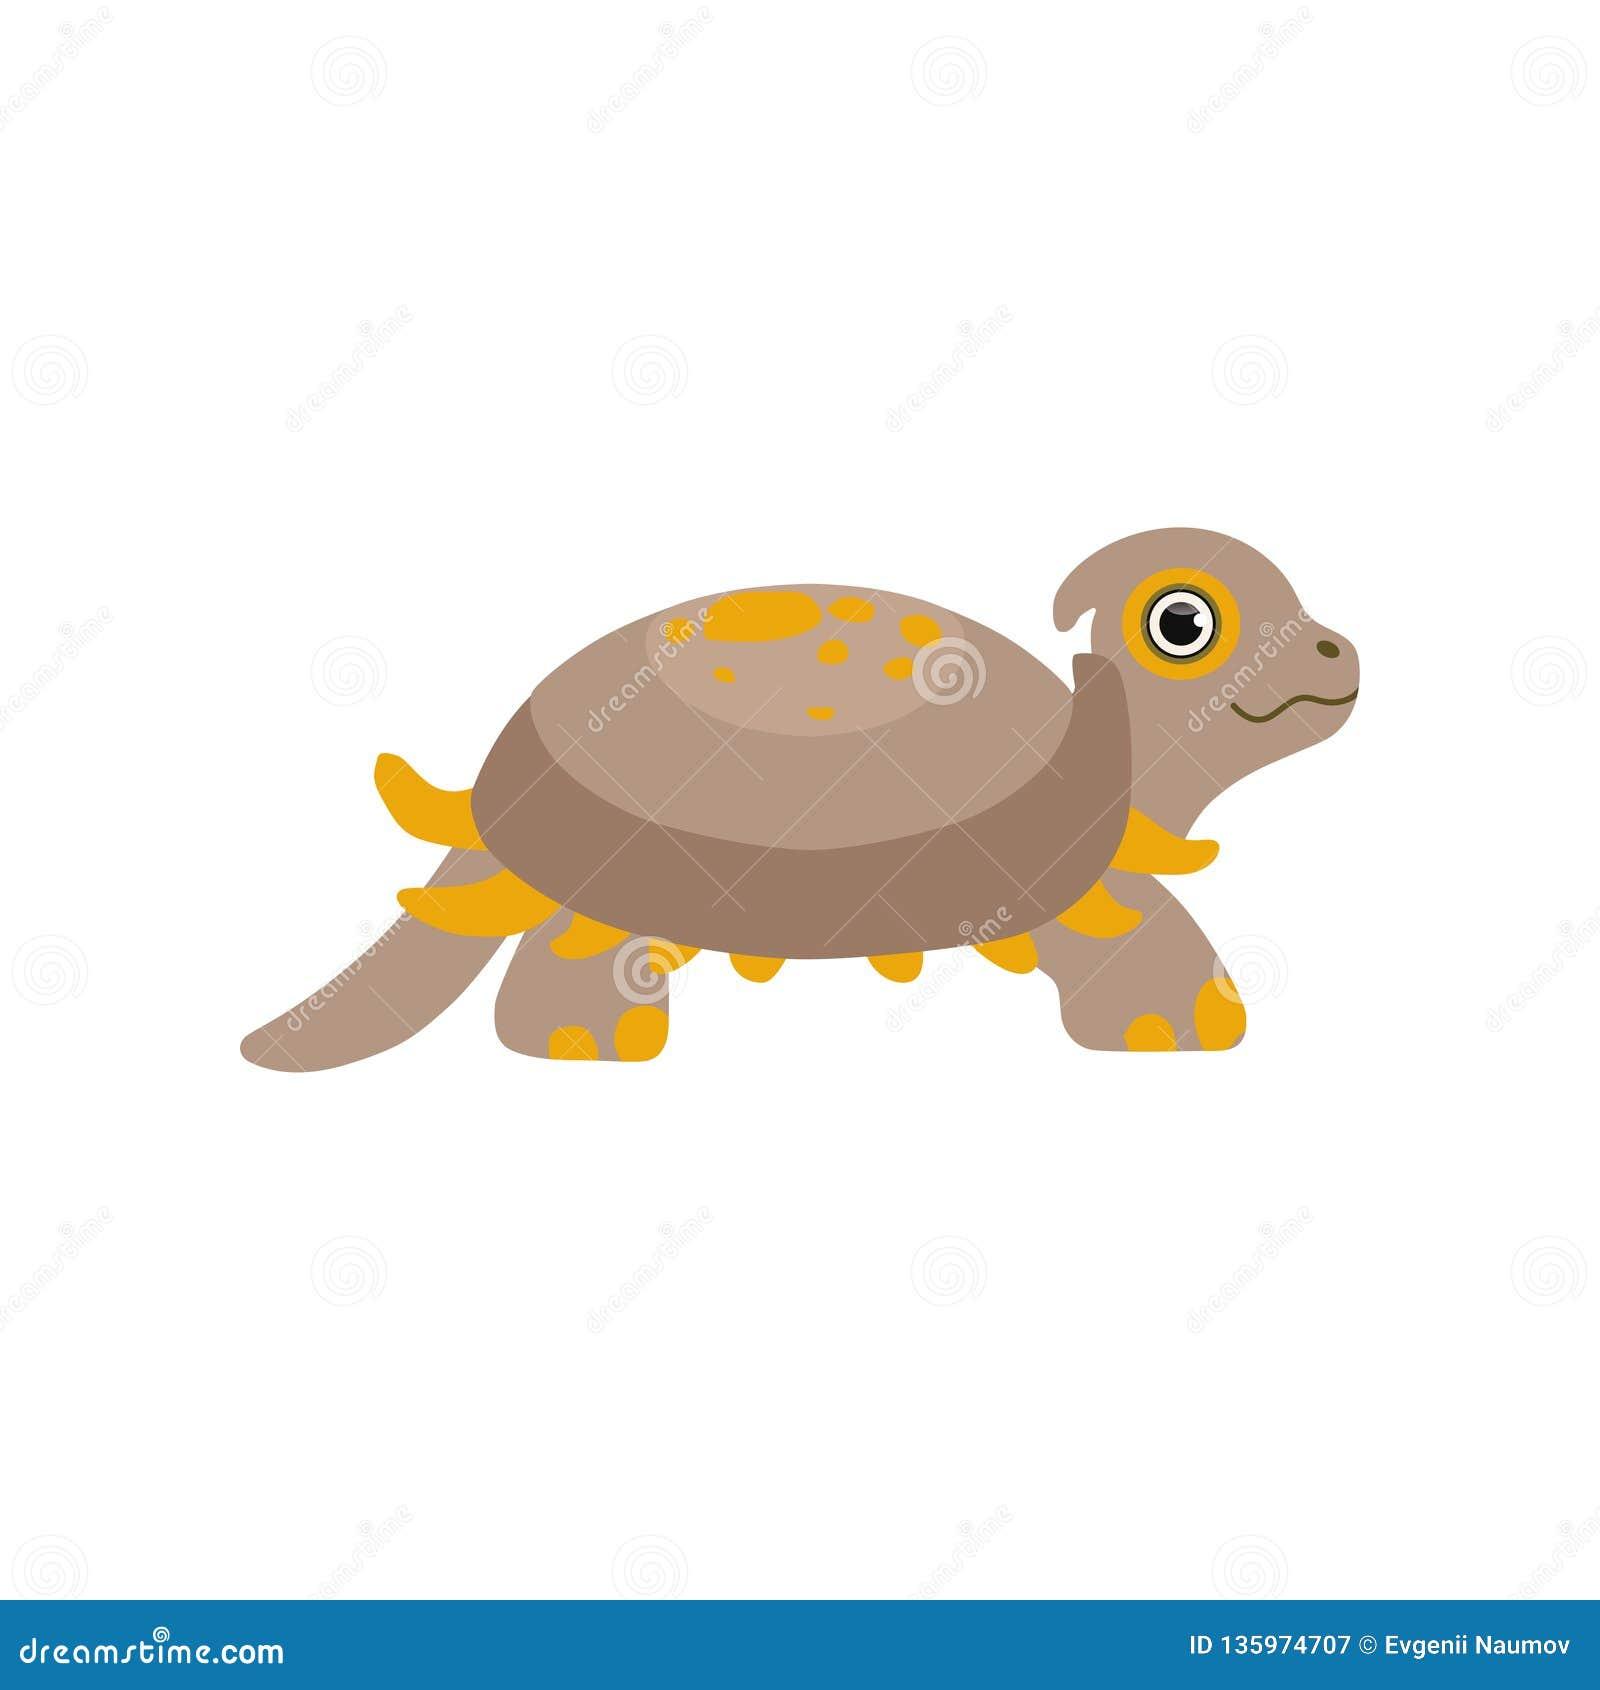 Cute prehistoric turtle, funny baby amphibian animal character vector Illustration